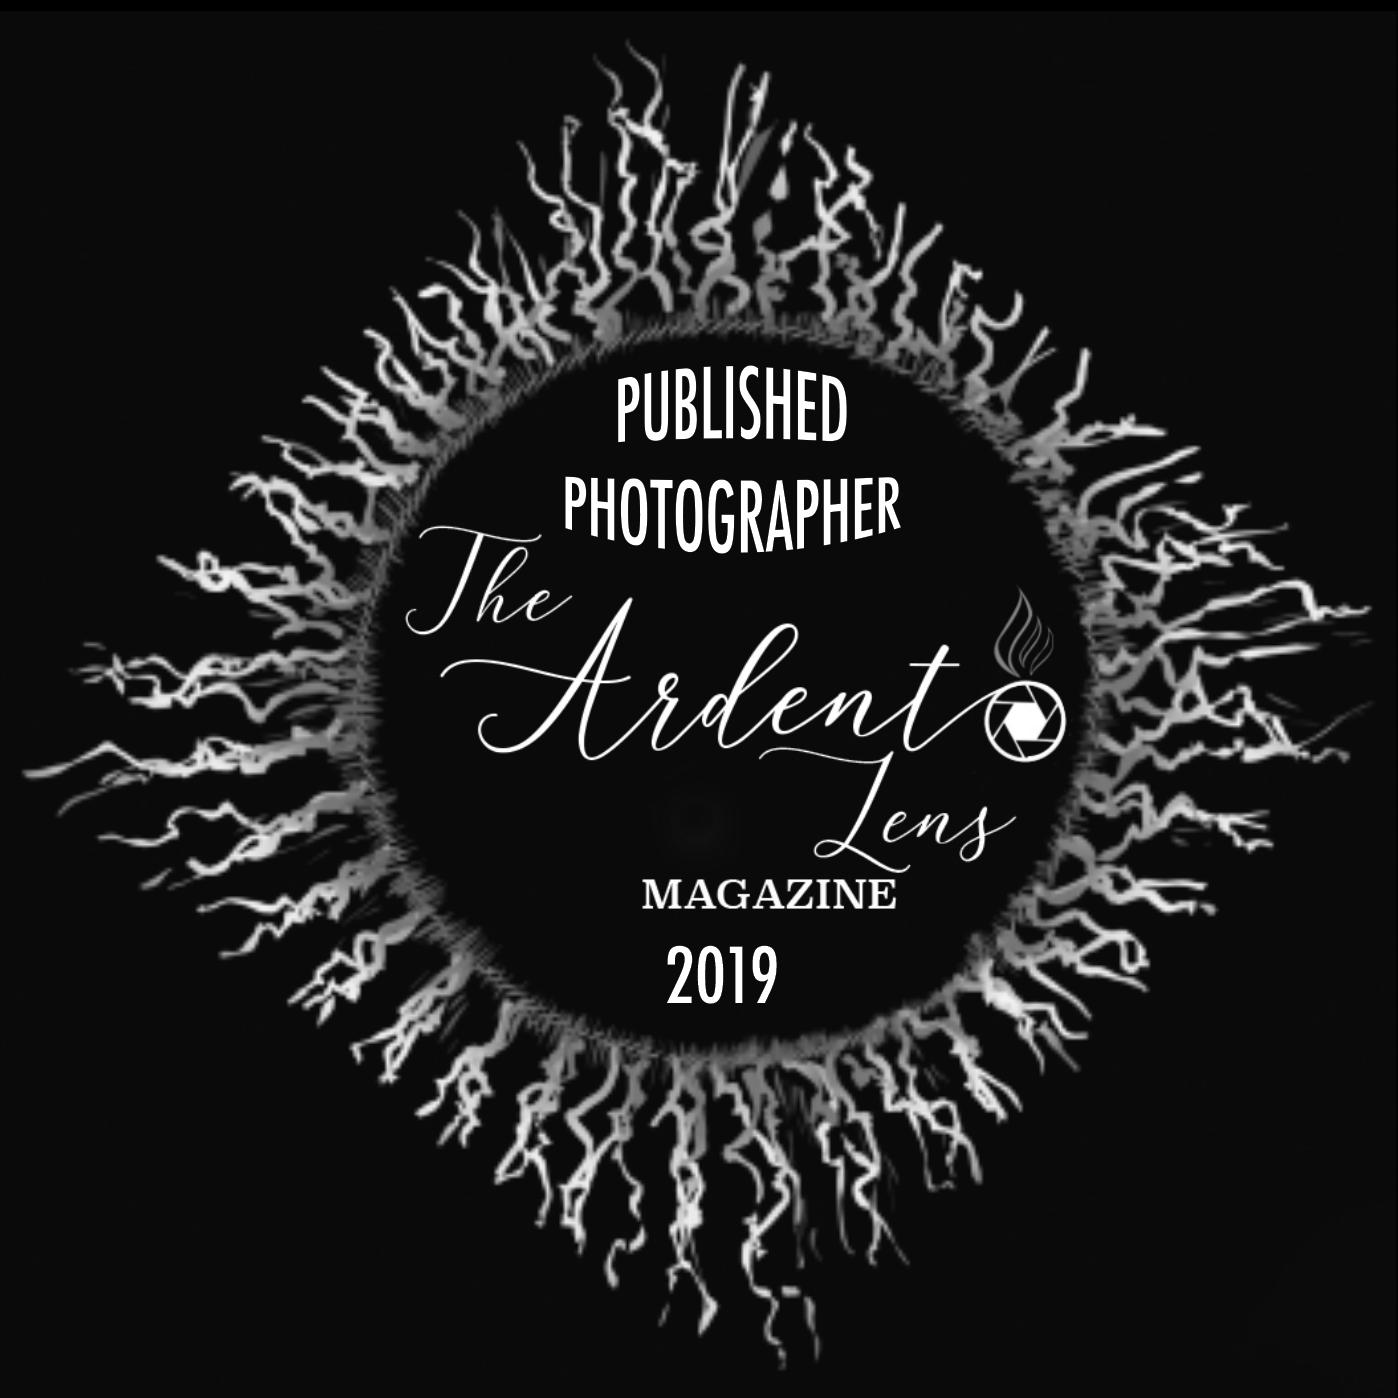 Ardent Lens magazine publication stamp, published photographer